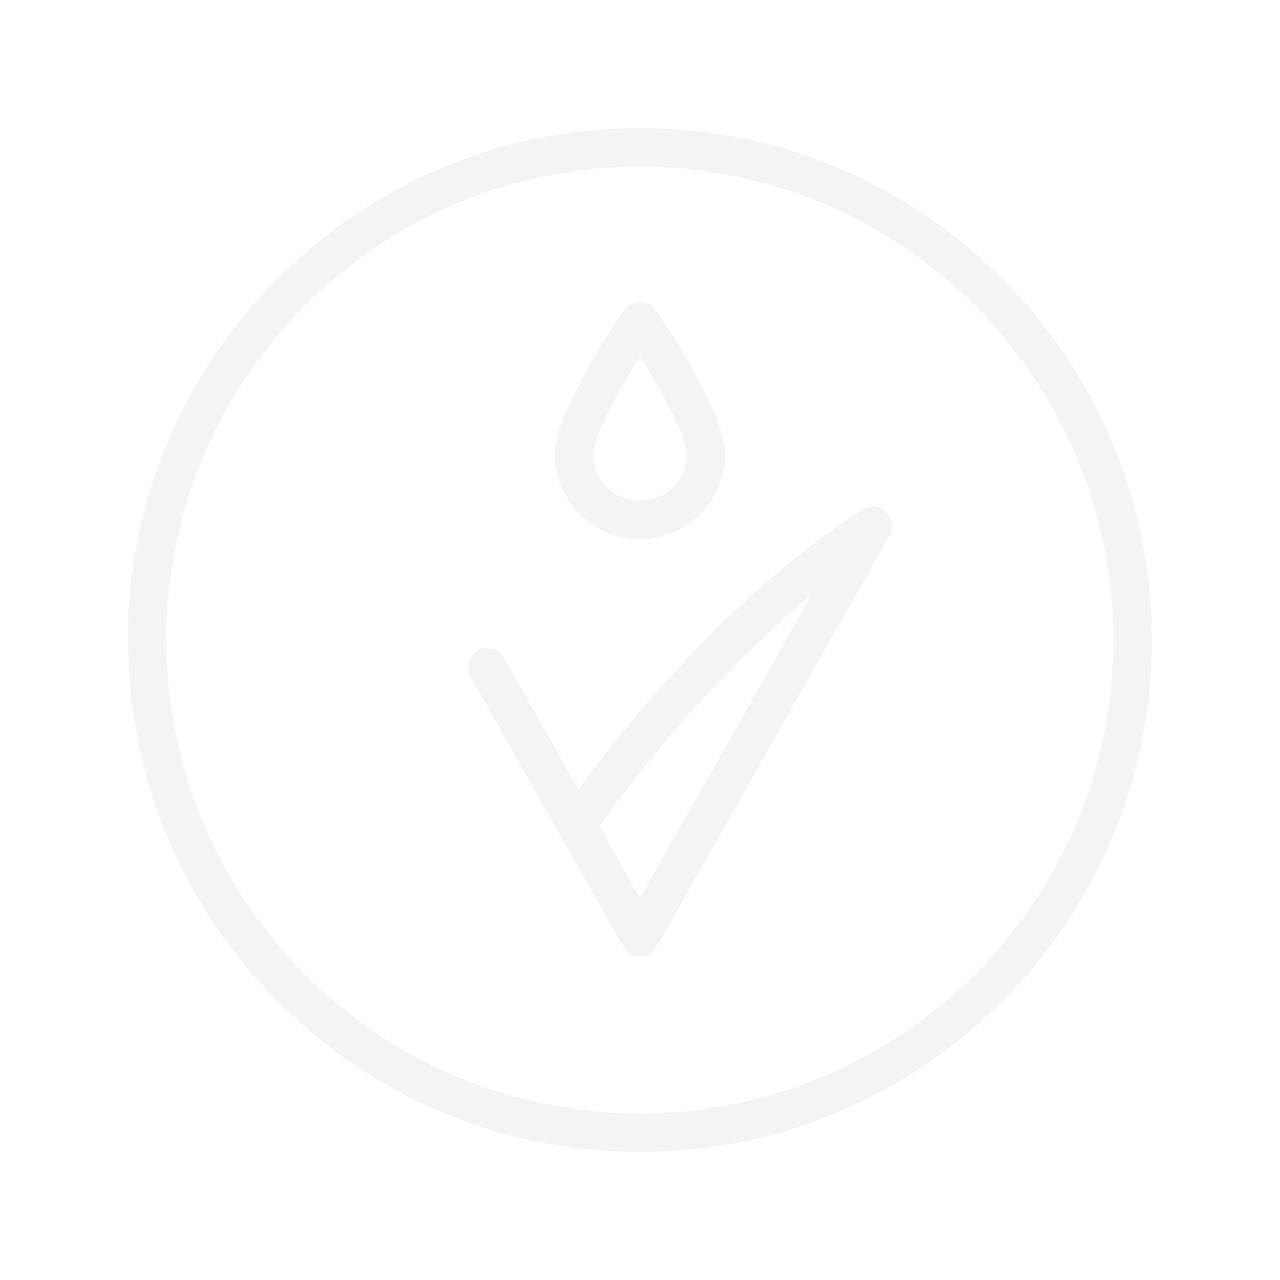 HOLIKA HOLIKA Pure Essence Green Tea Morning Mask 30pcs утренние тканевые маски